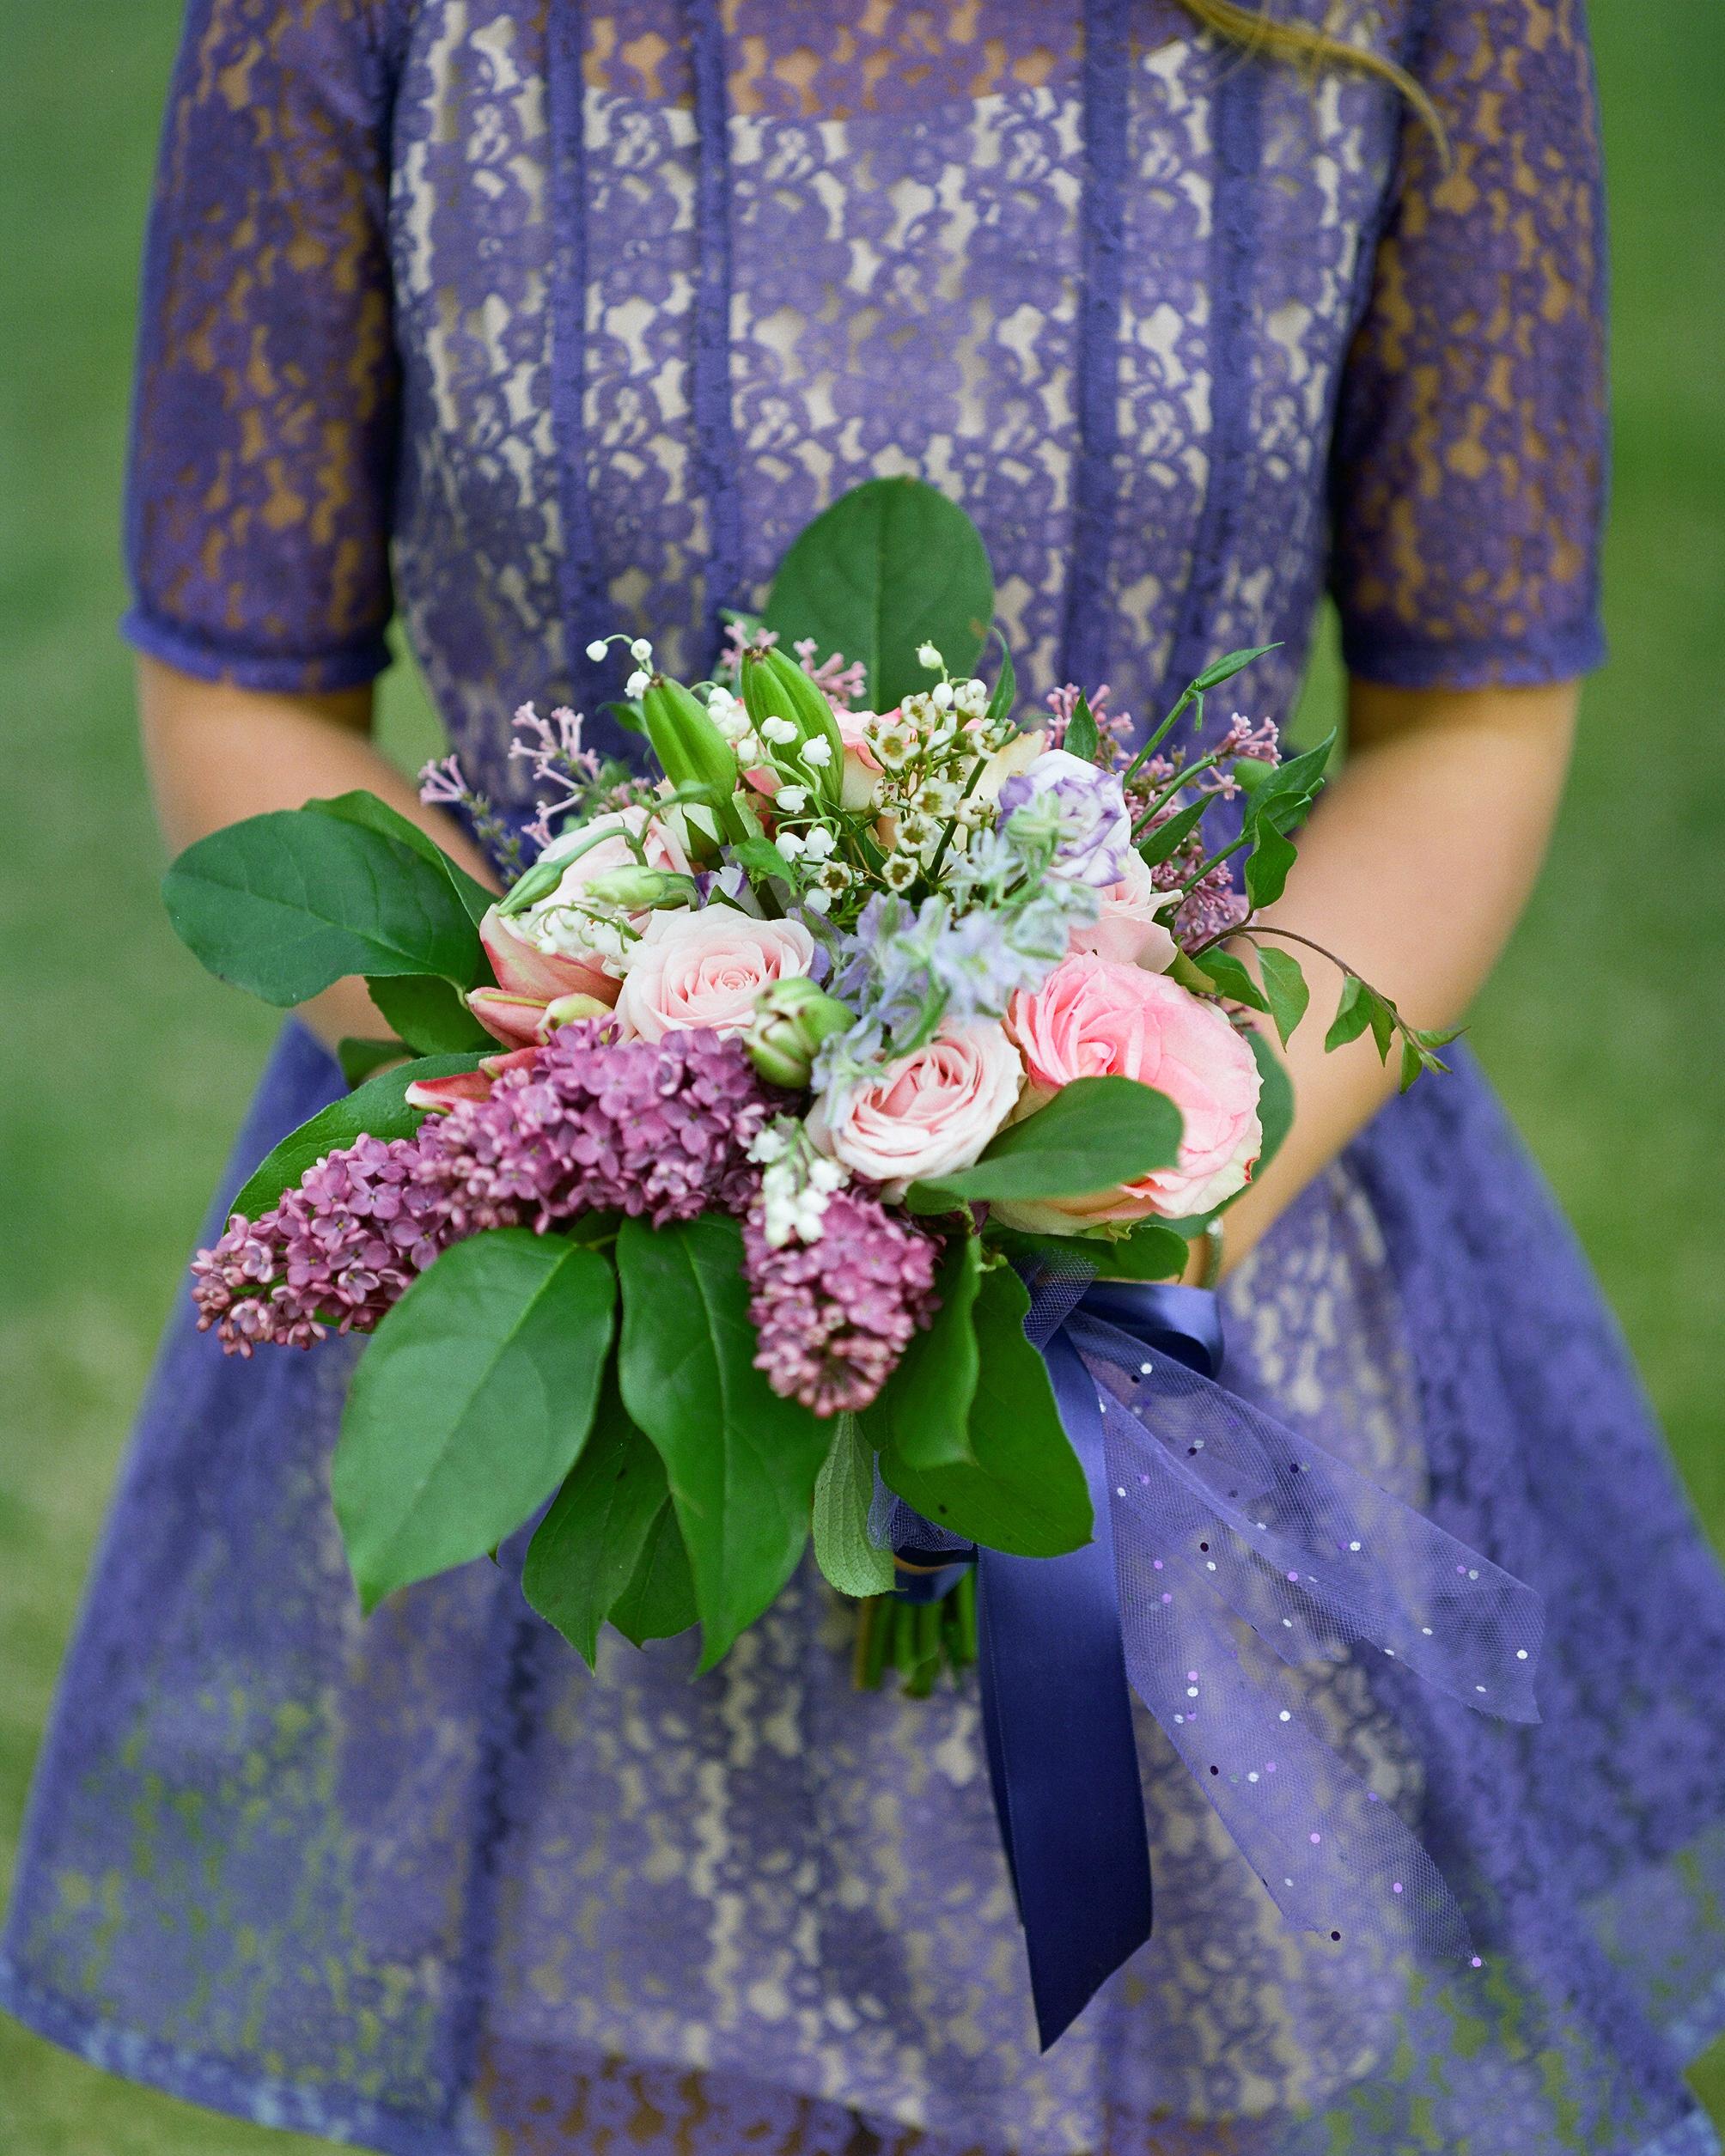 libby-allen-wedding-bouquet-061-s112487-0116.jpg